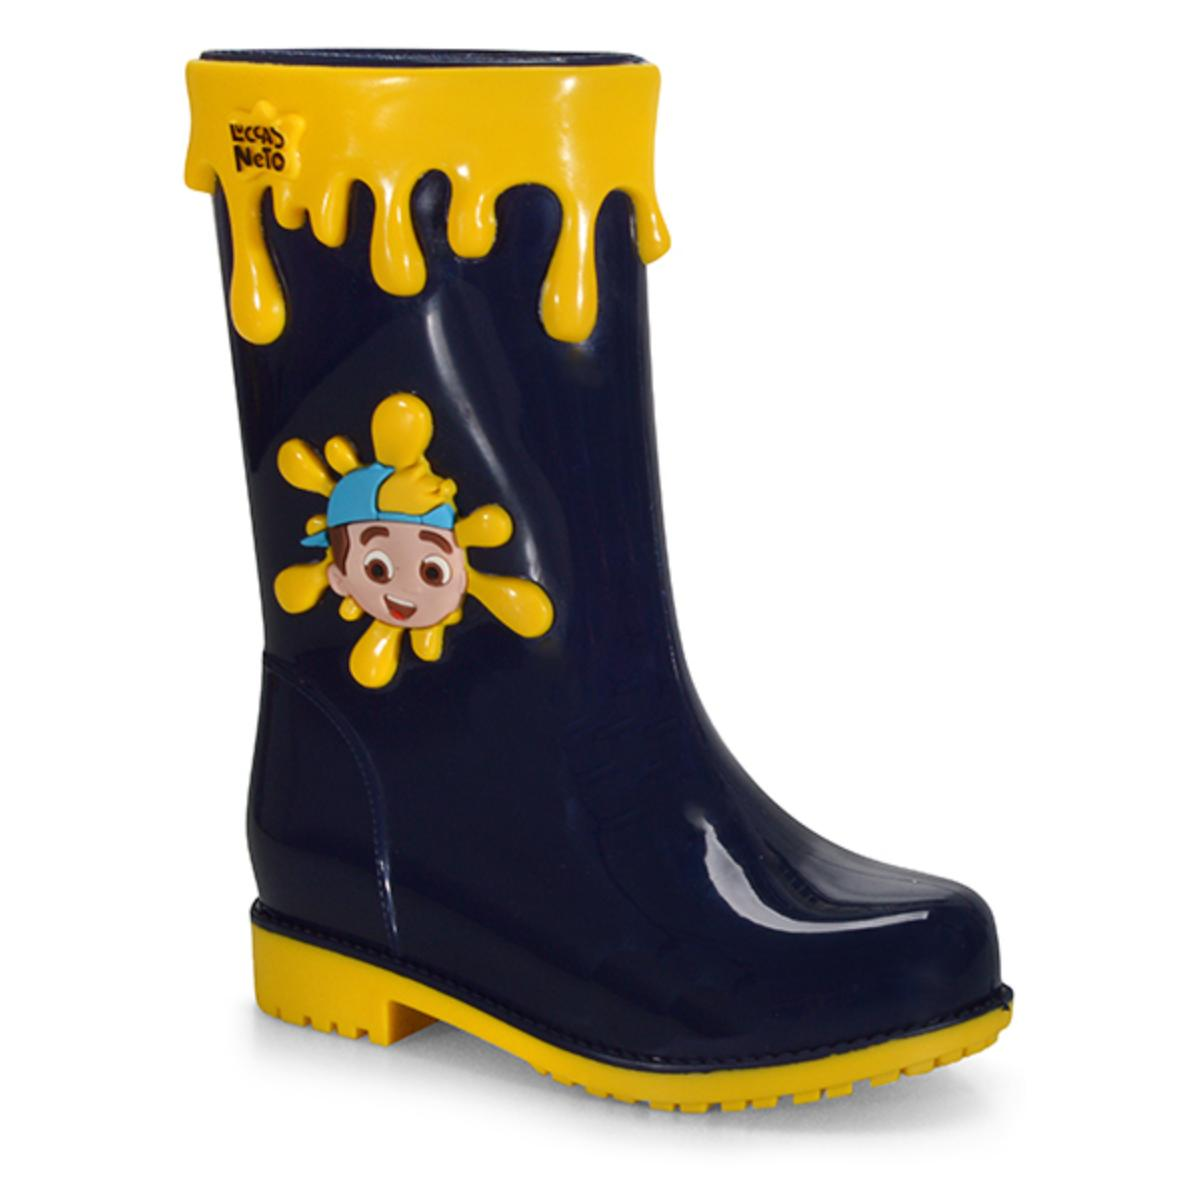 Galocha Masc Infantil Grendene 22291 50877 Luccas Neto Adventure Azul/amarelo